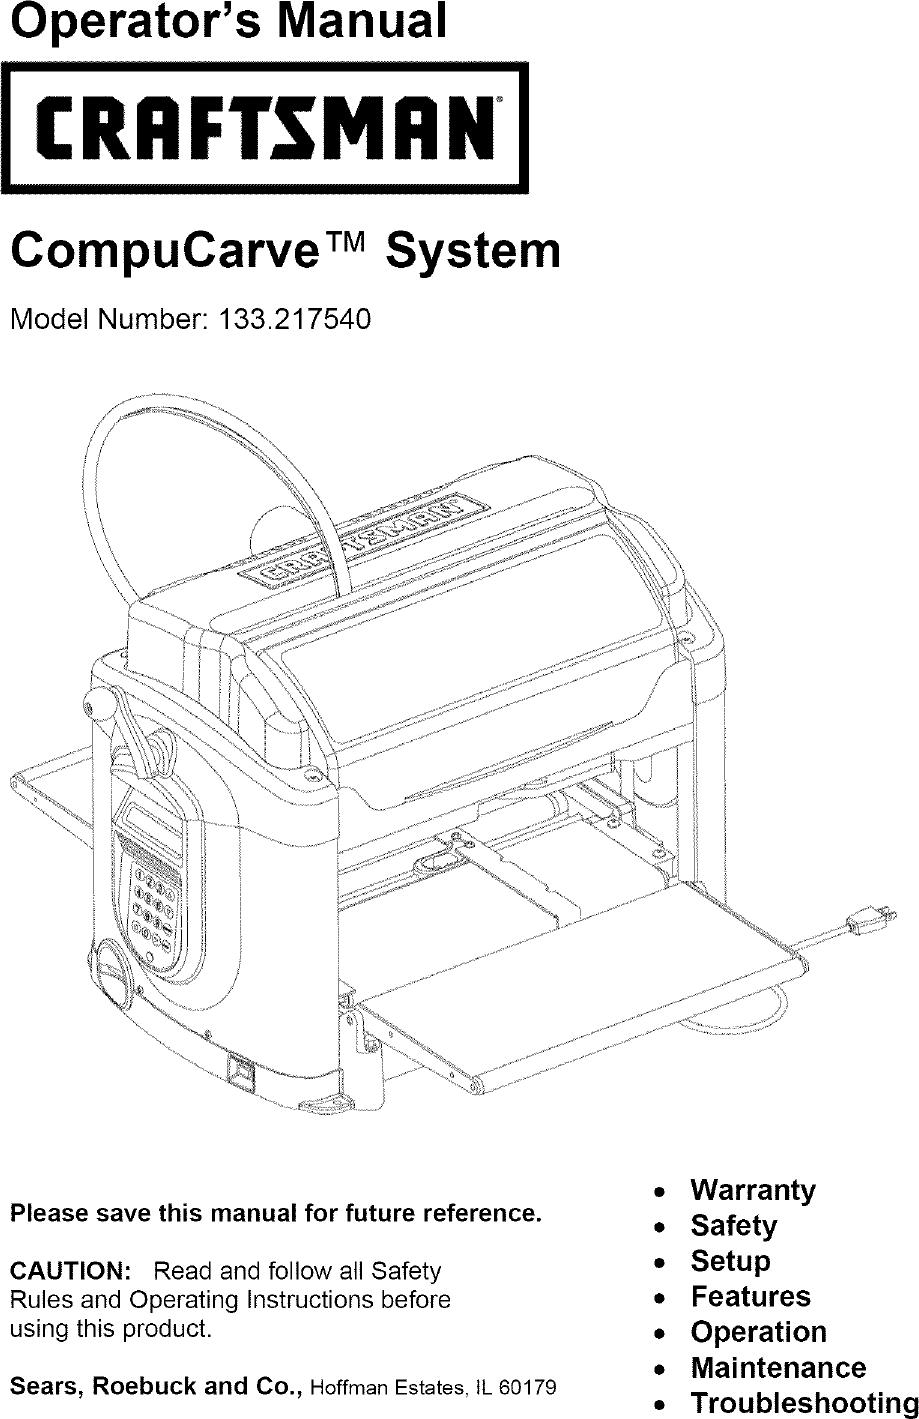 Craftsman 133217540 User Manual COMPUCARVE Manuals And